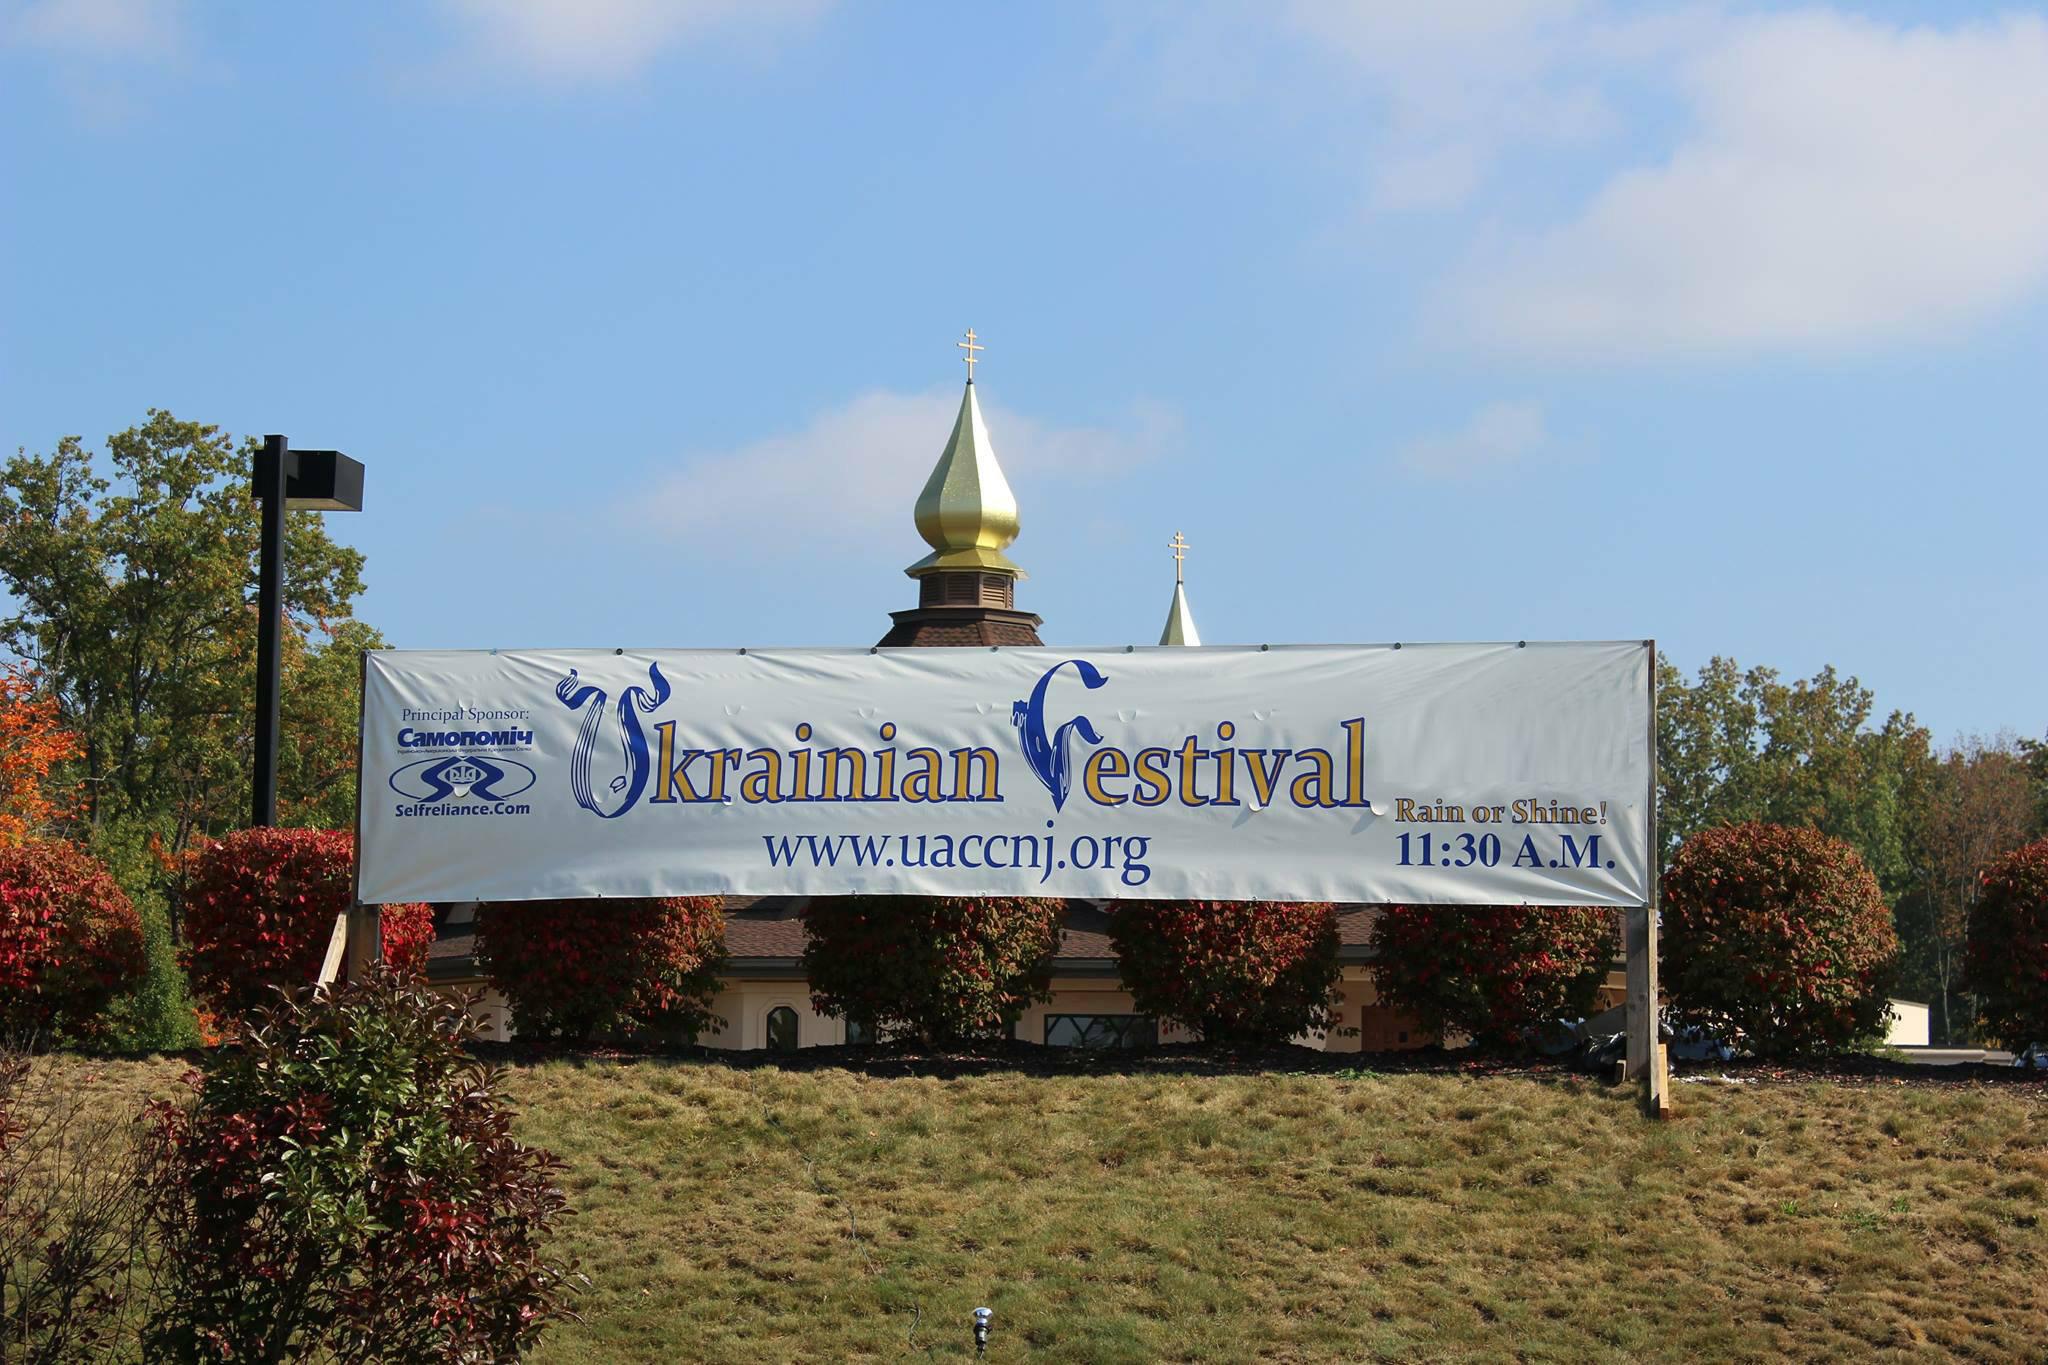 Annual Ukrainian Festival